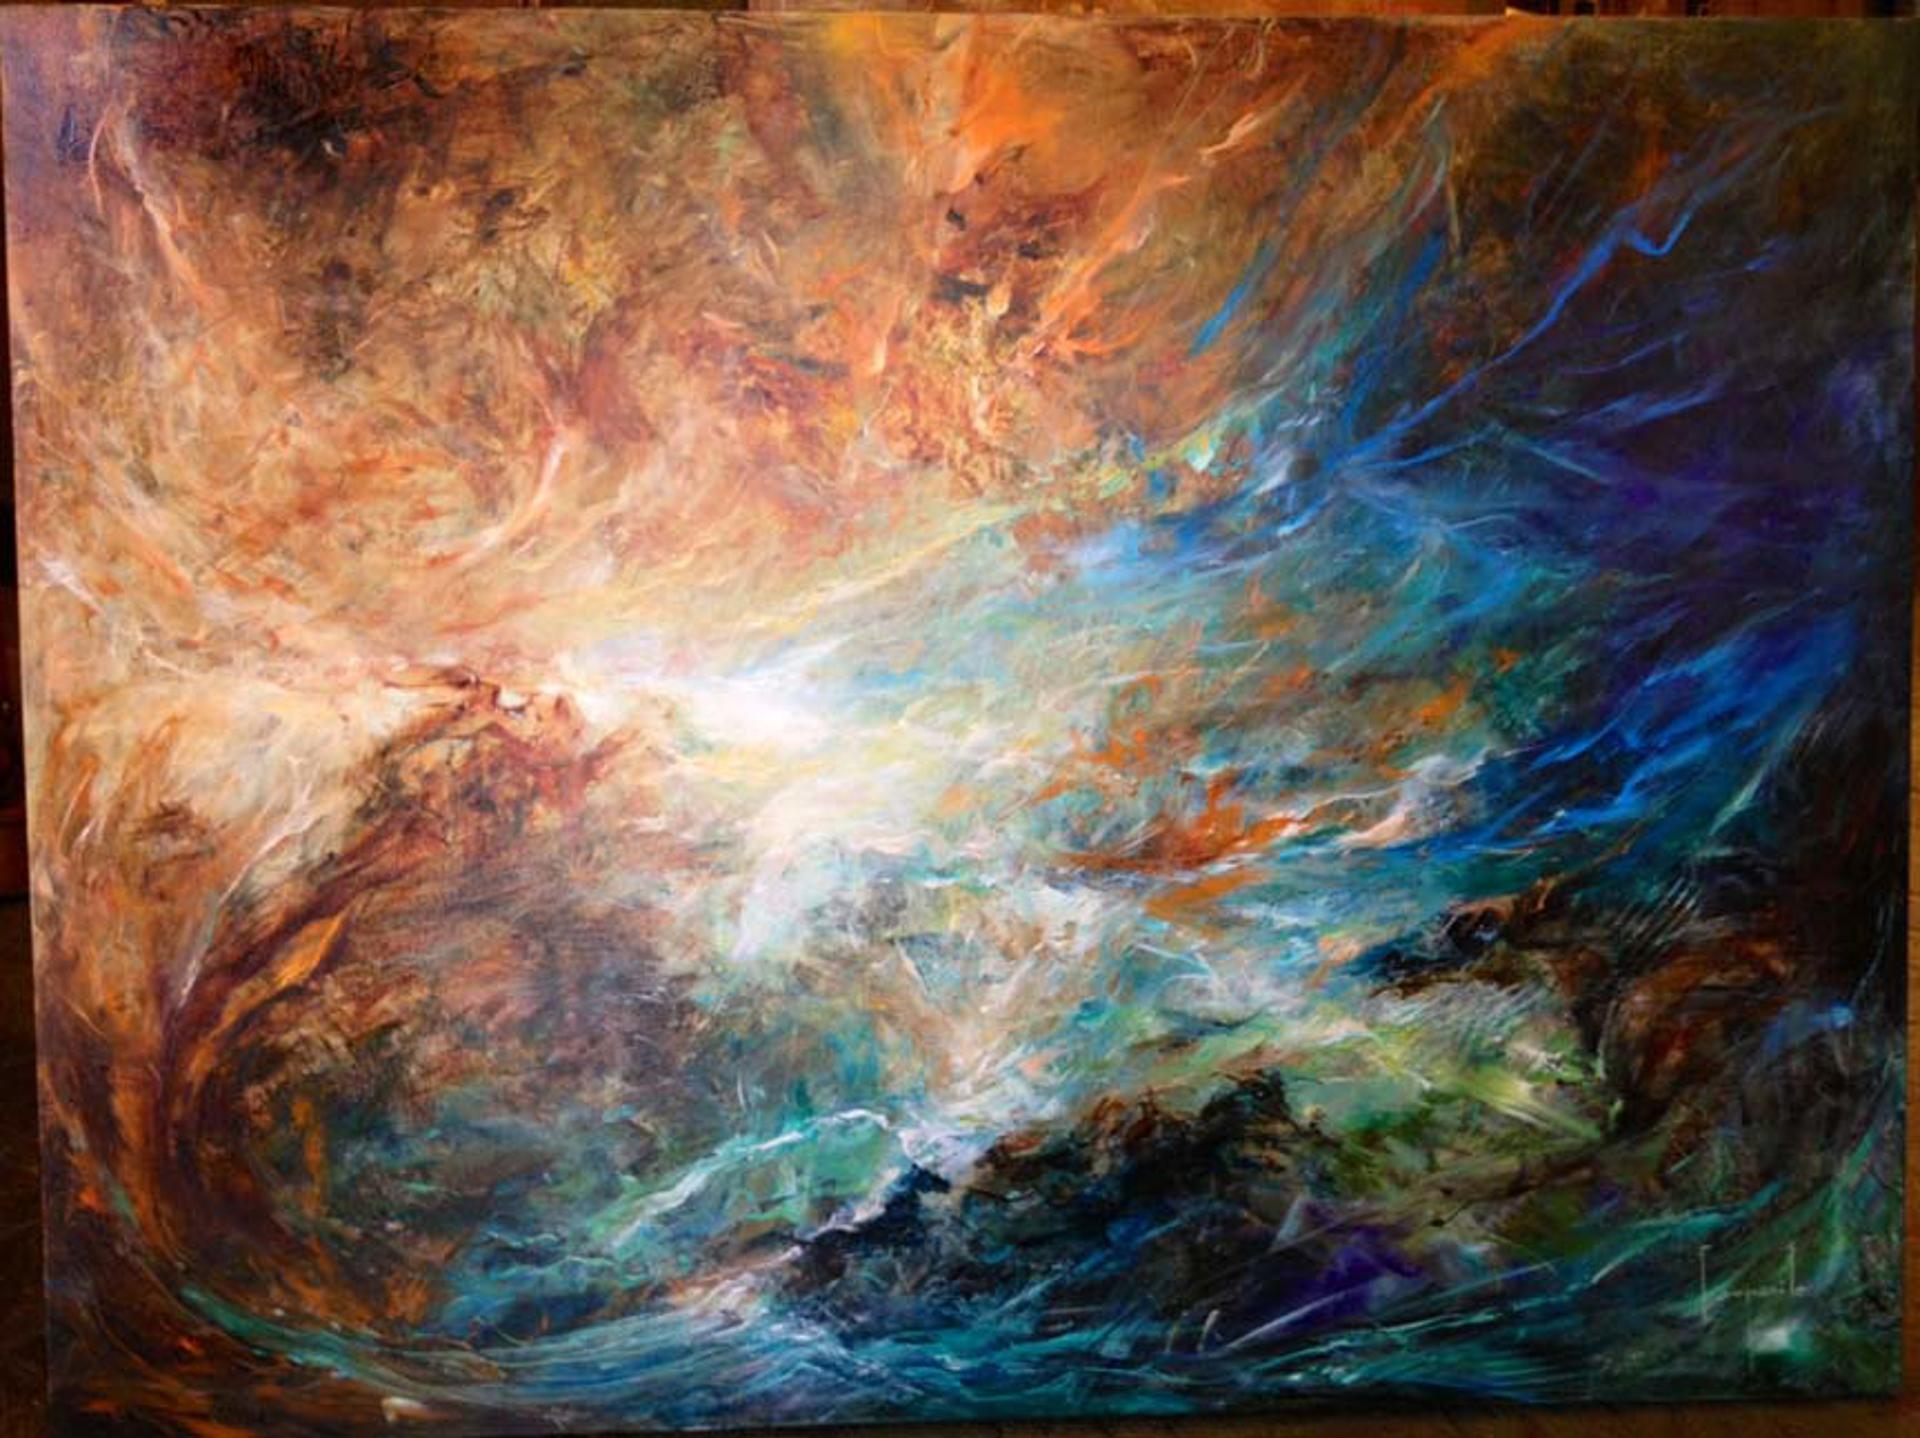 Into The Depths by Dario Campanile